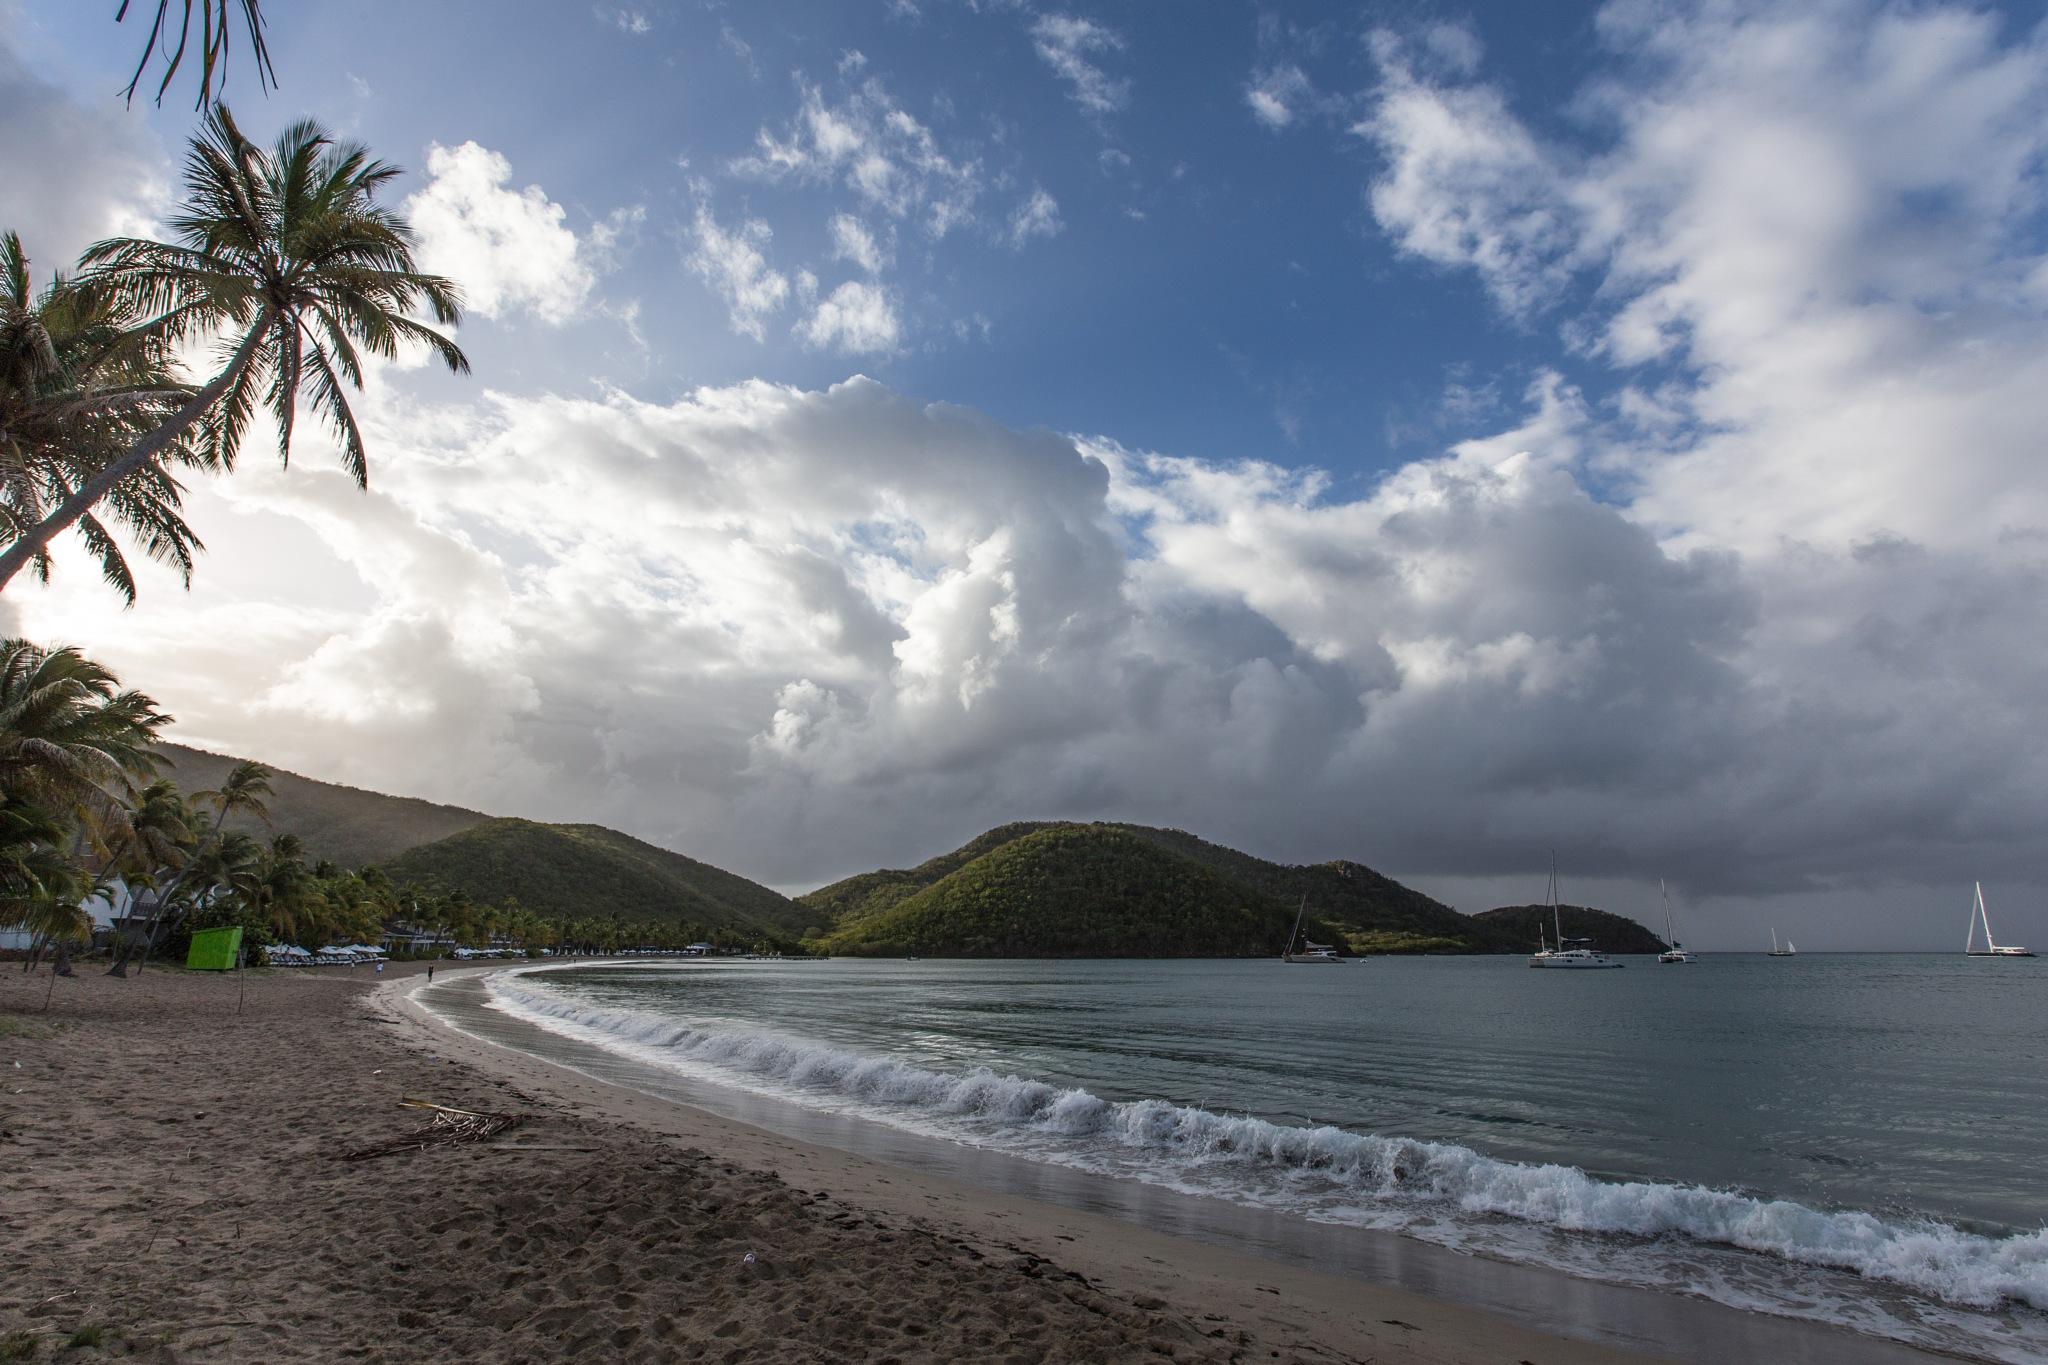 Carlisle Bay Antigua, Old Road, Saint Mary's, Antigua & BarbudaCarlisle Bay Antigua, Old Road, Saint by Andrei Snitko